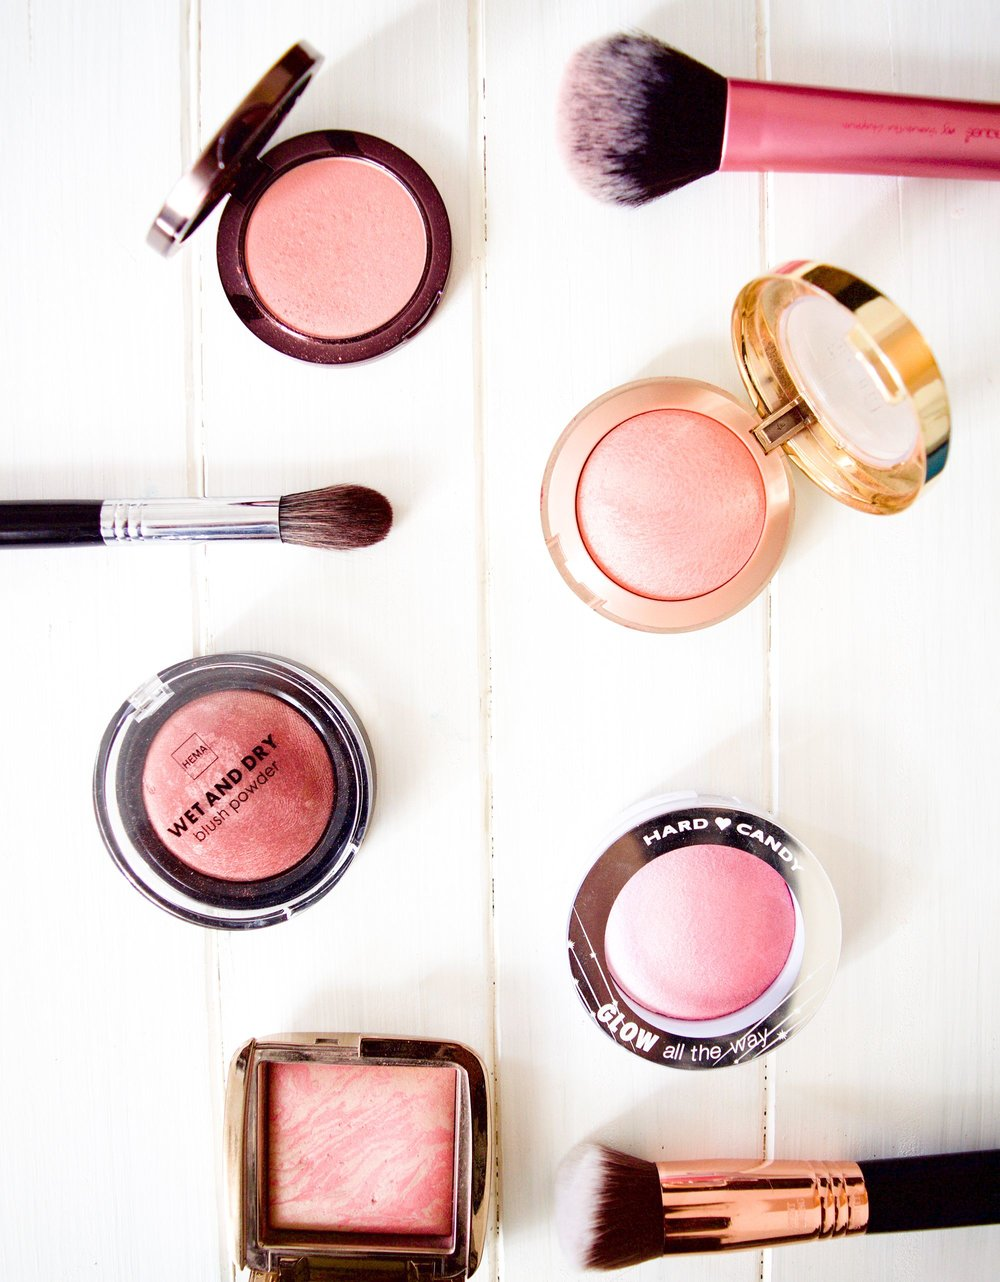 shimmer blush | glowing blush | peach blush | blush